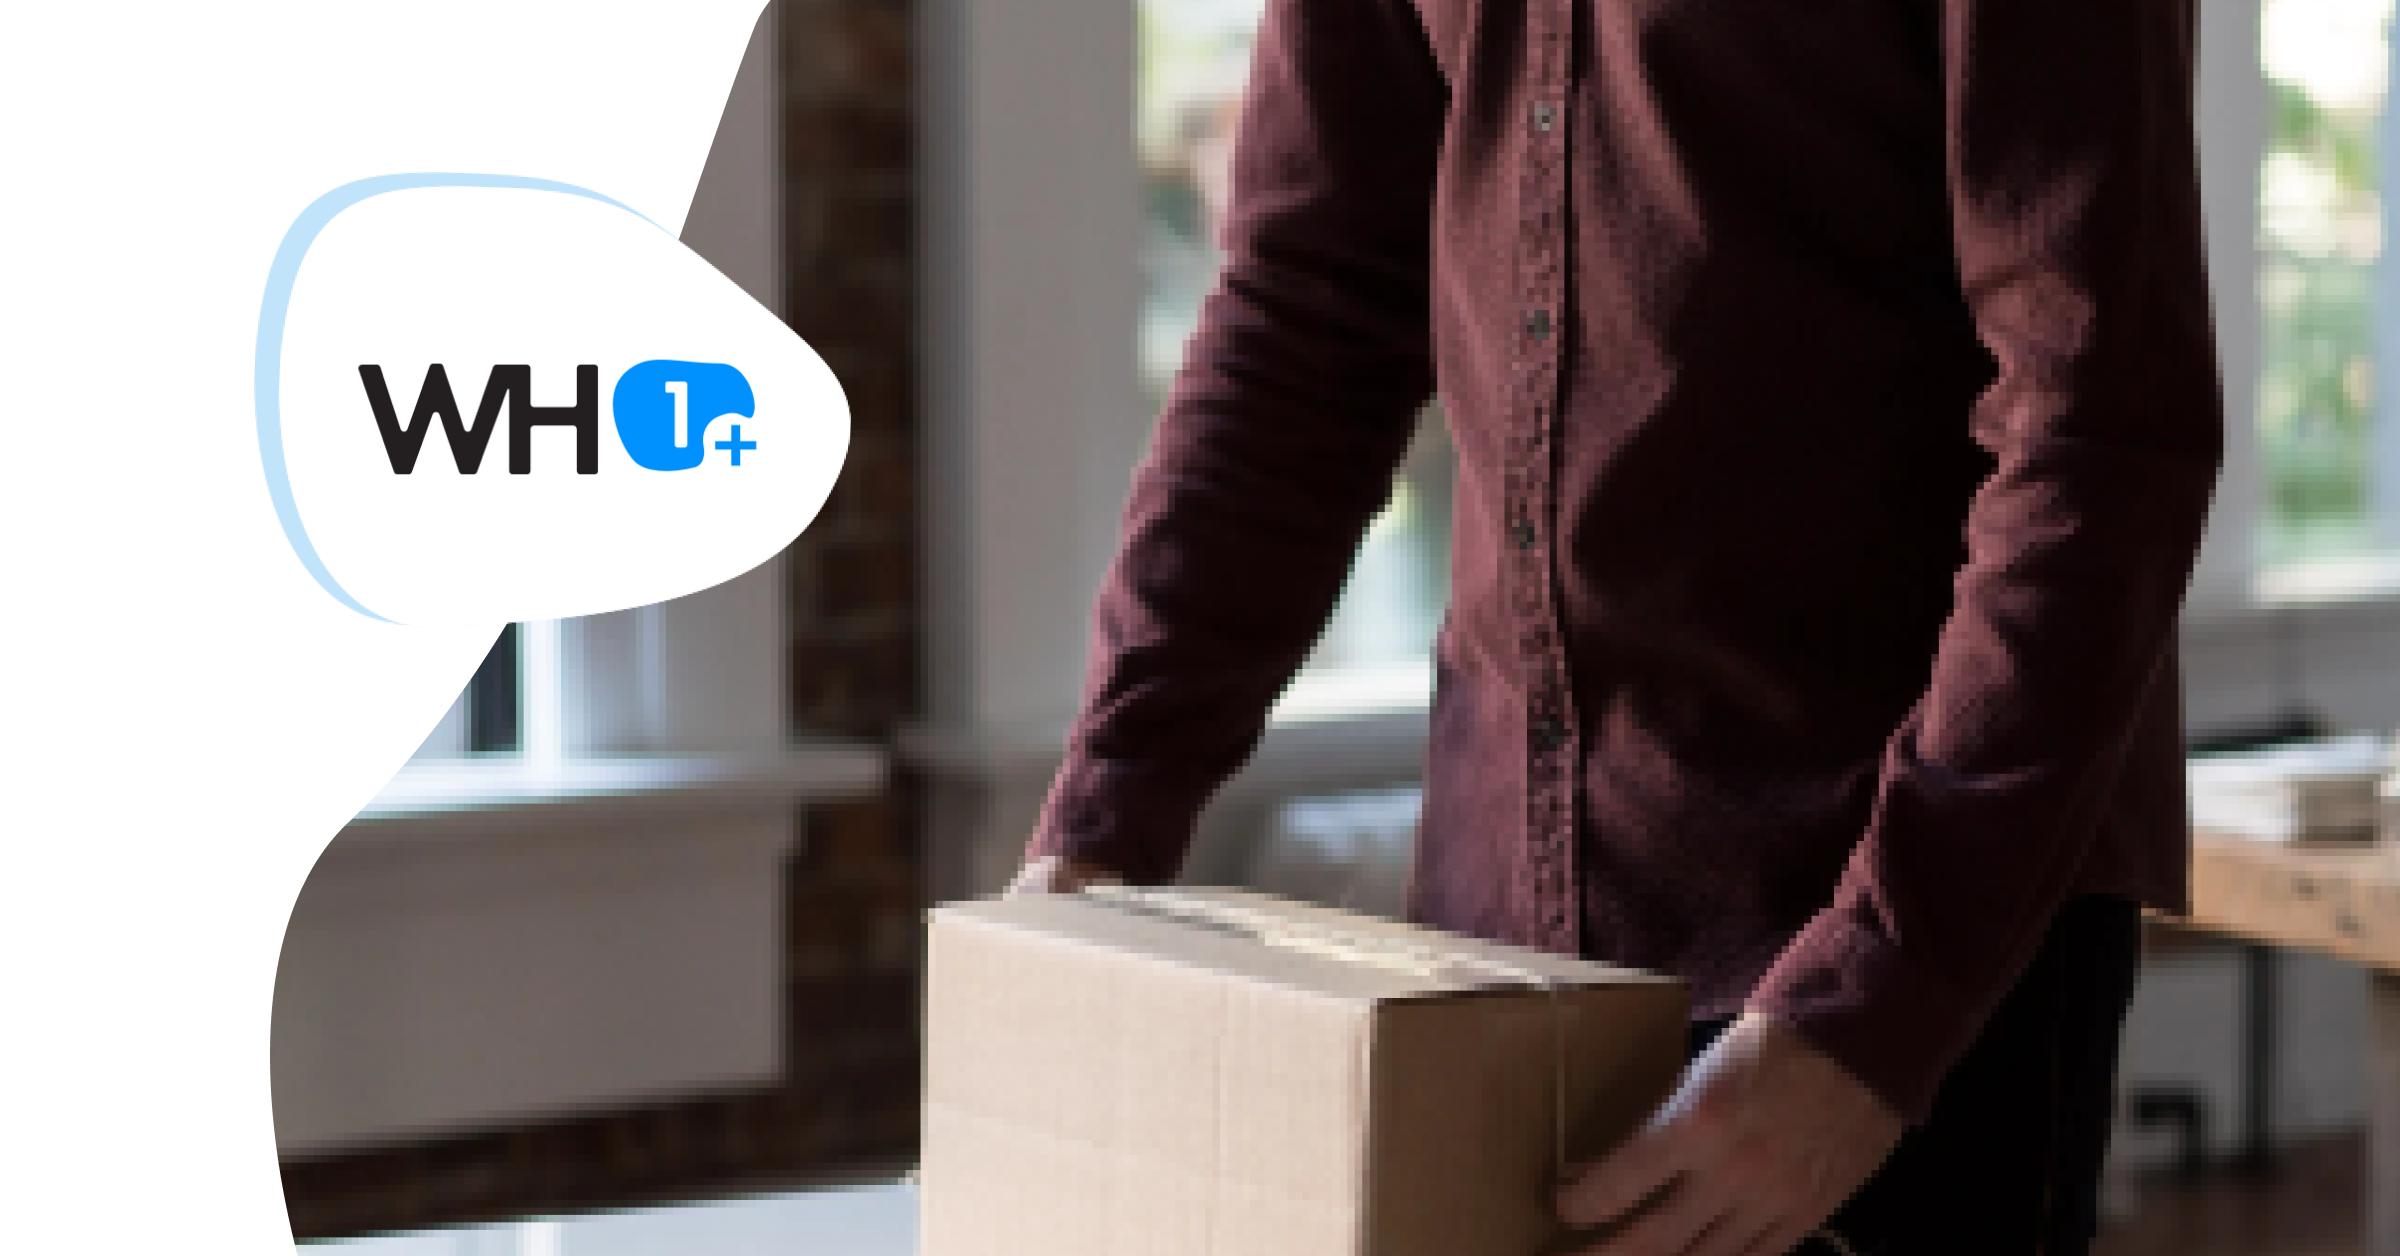 "Warehousing1 launcht Premium-Fulfillmentlösung ""WH1+"""